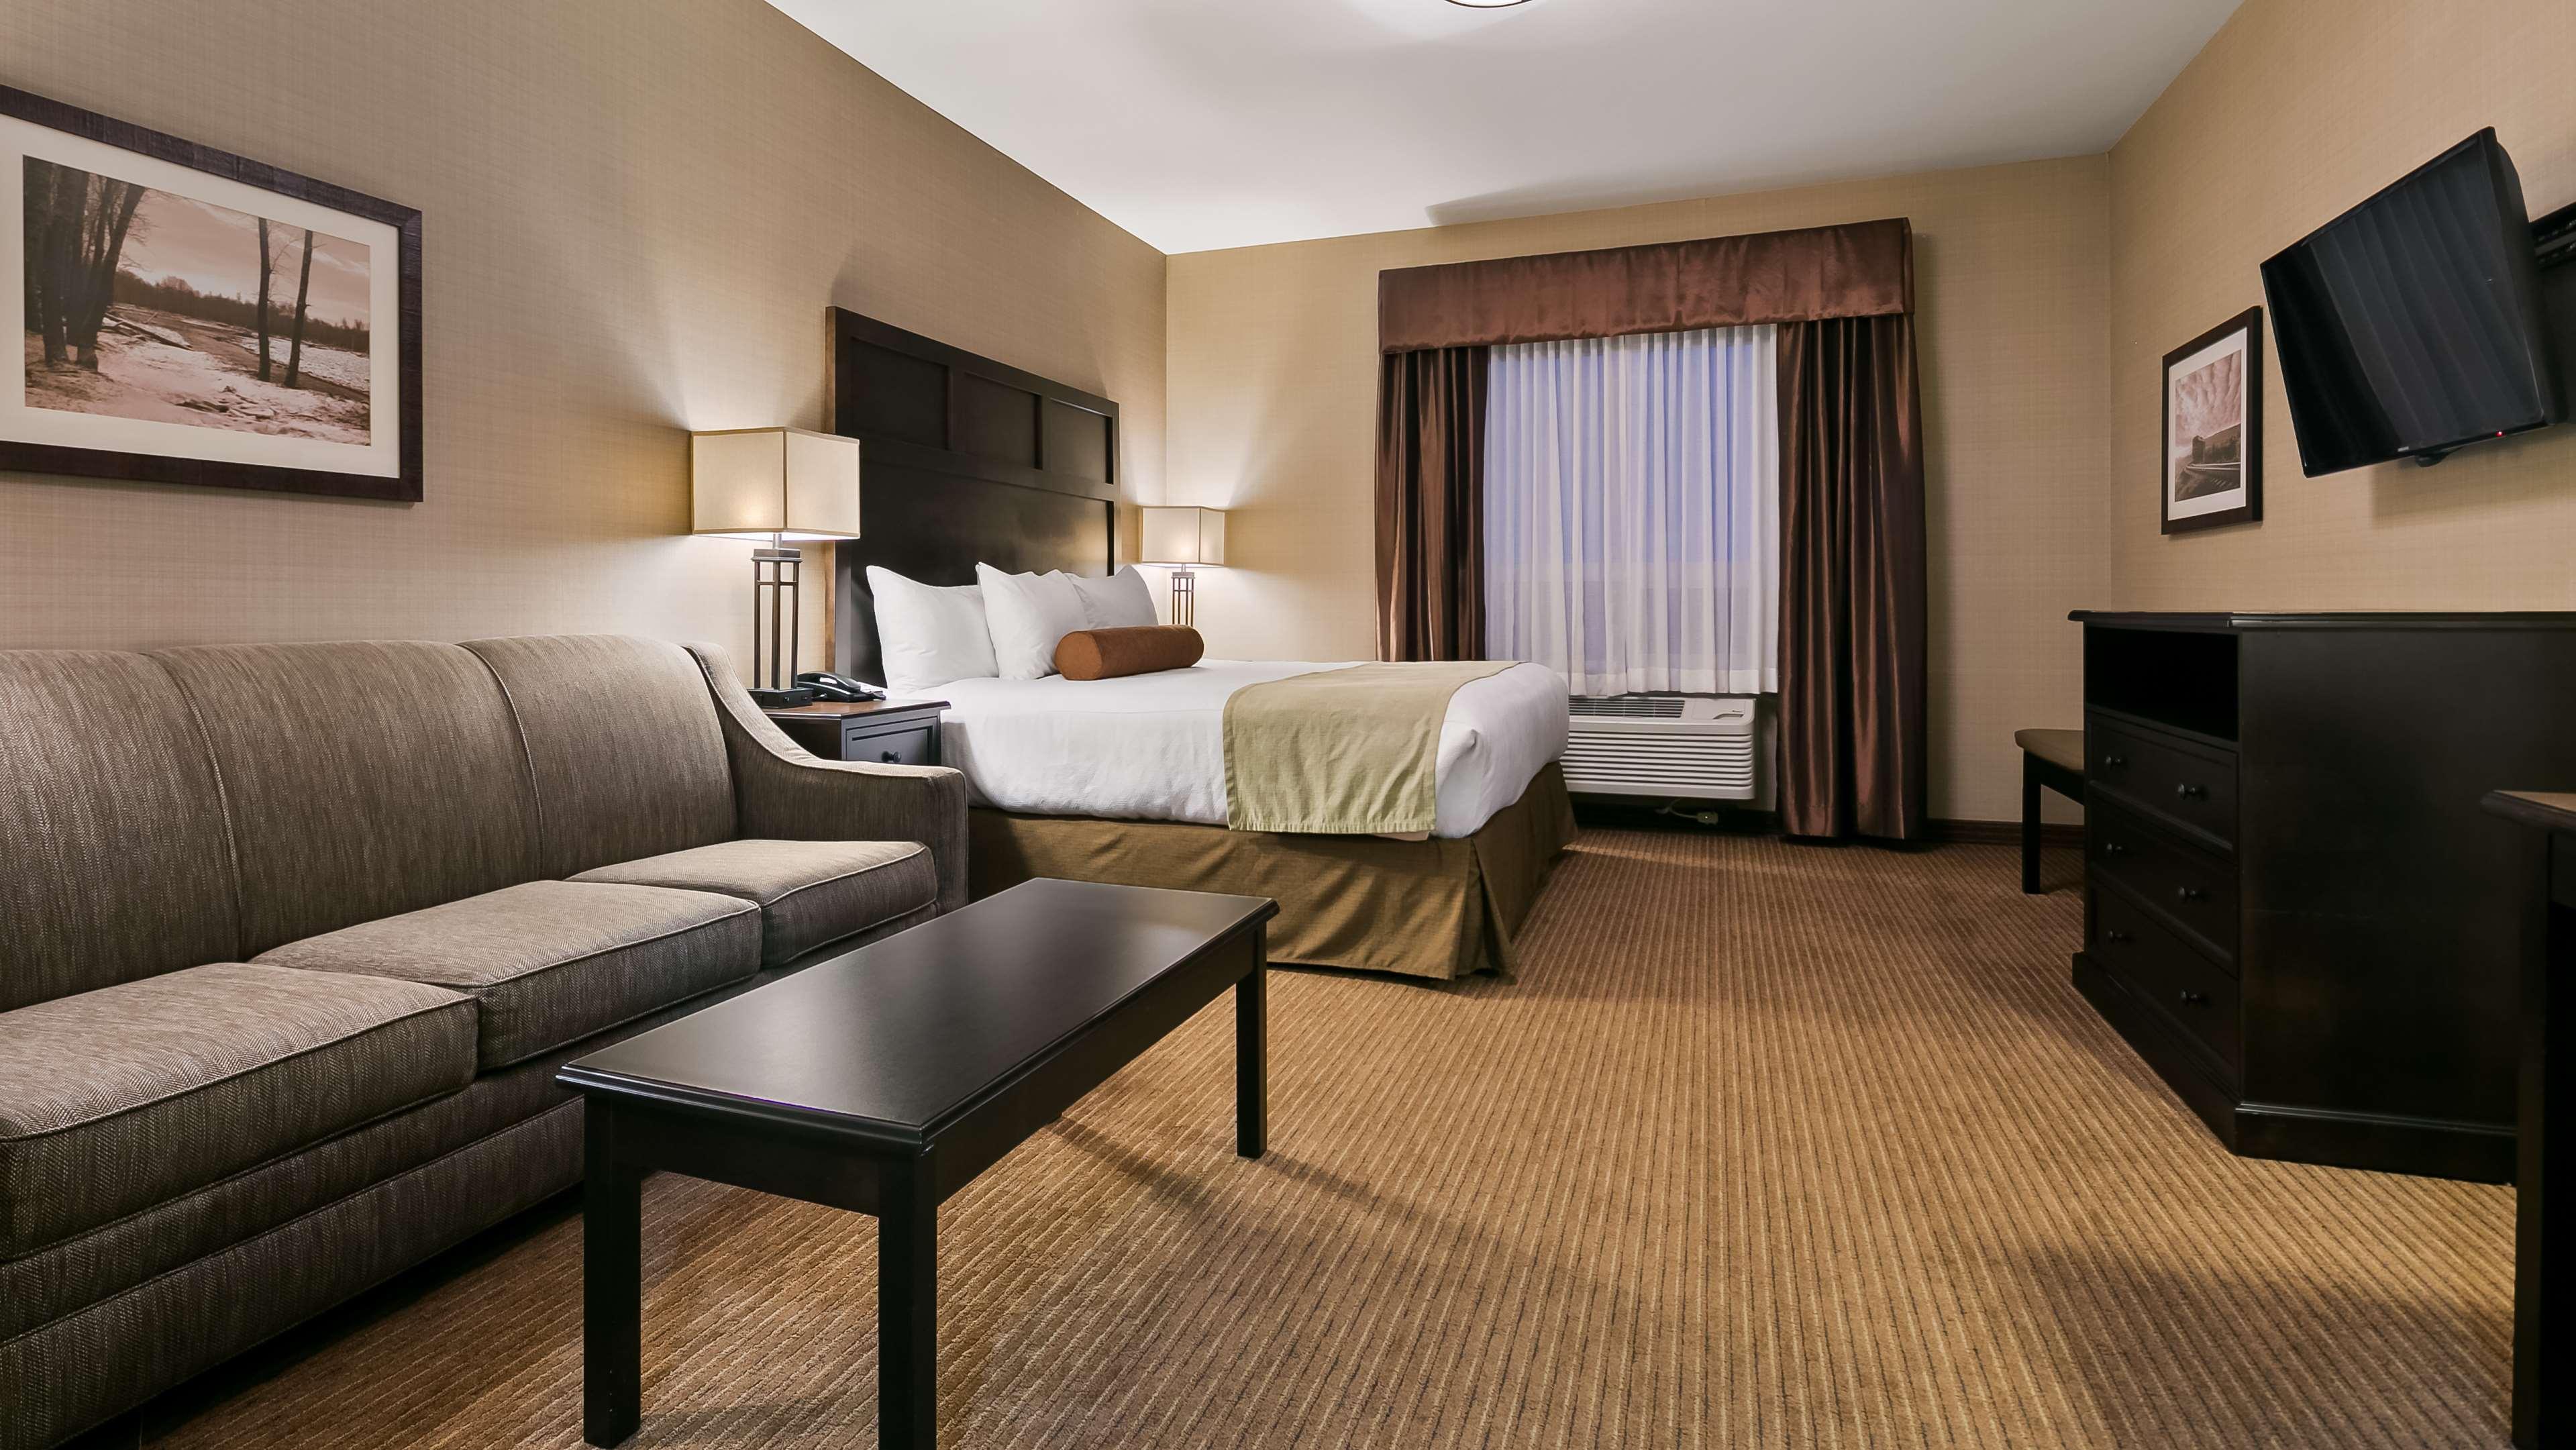 Hotel Rooms Okotoks